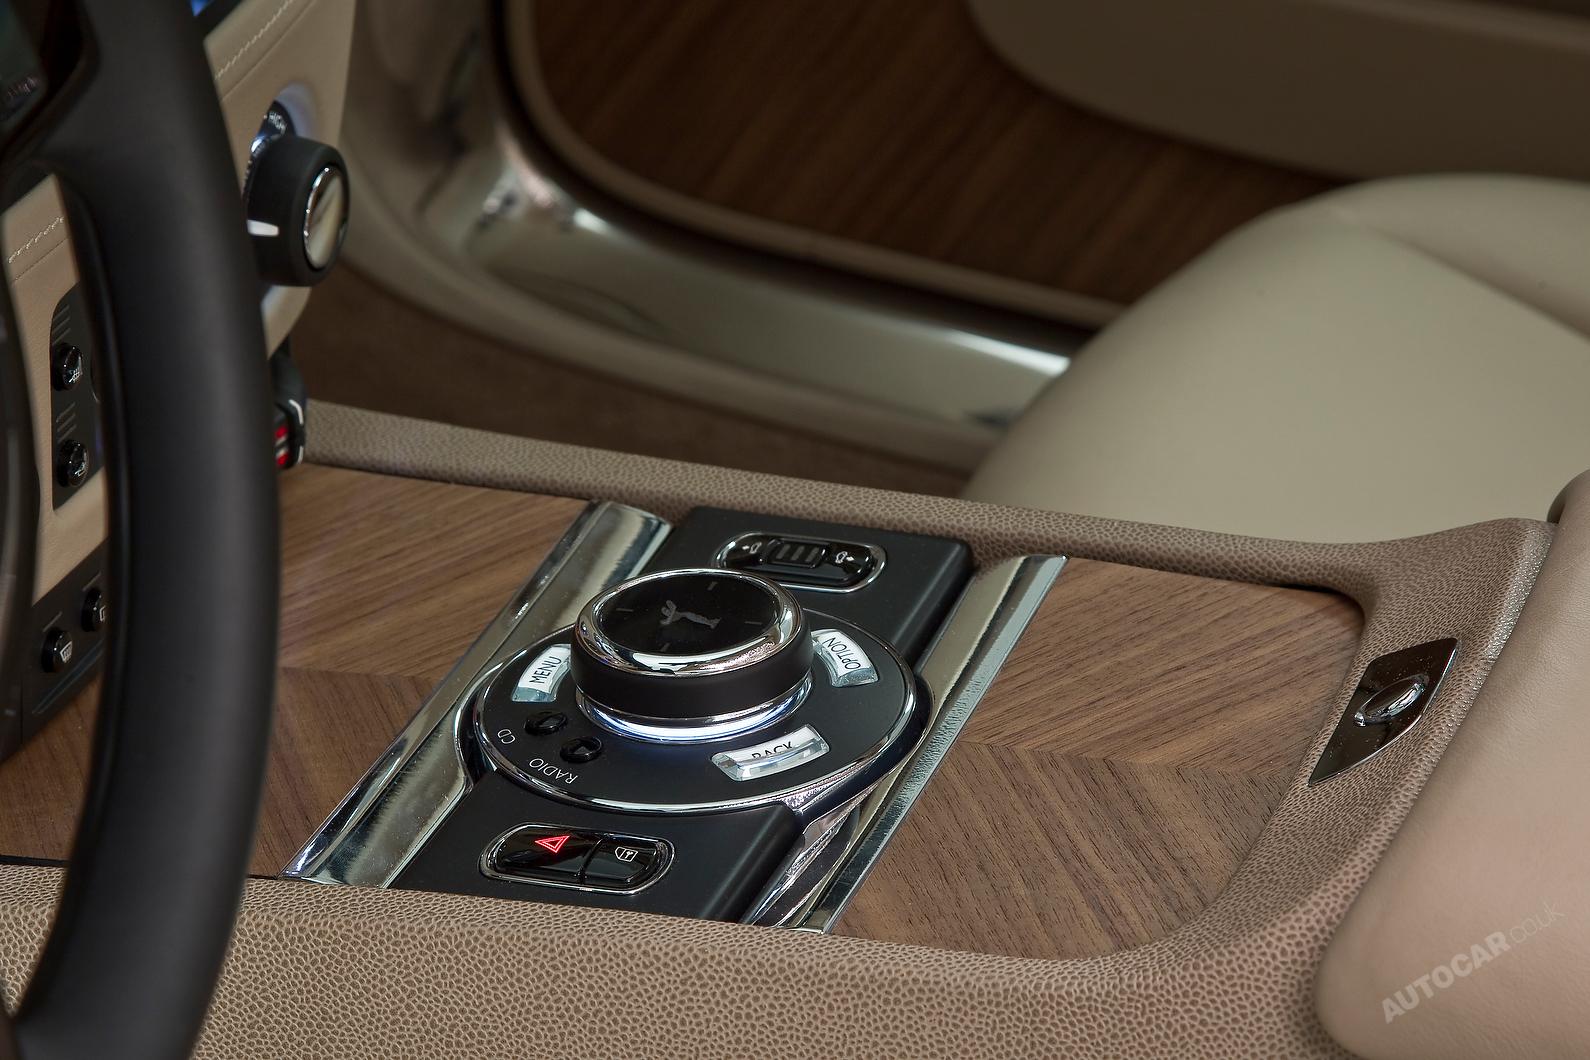 2013 - [Rolls Royce] Wraith - Page 4 Rolls-royce-wraith-25yjjmk